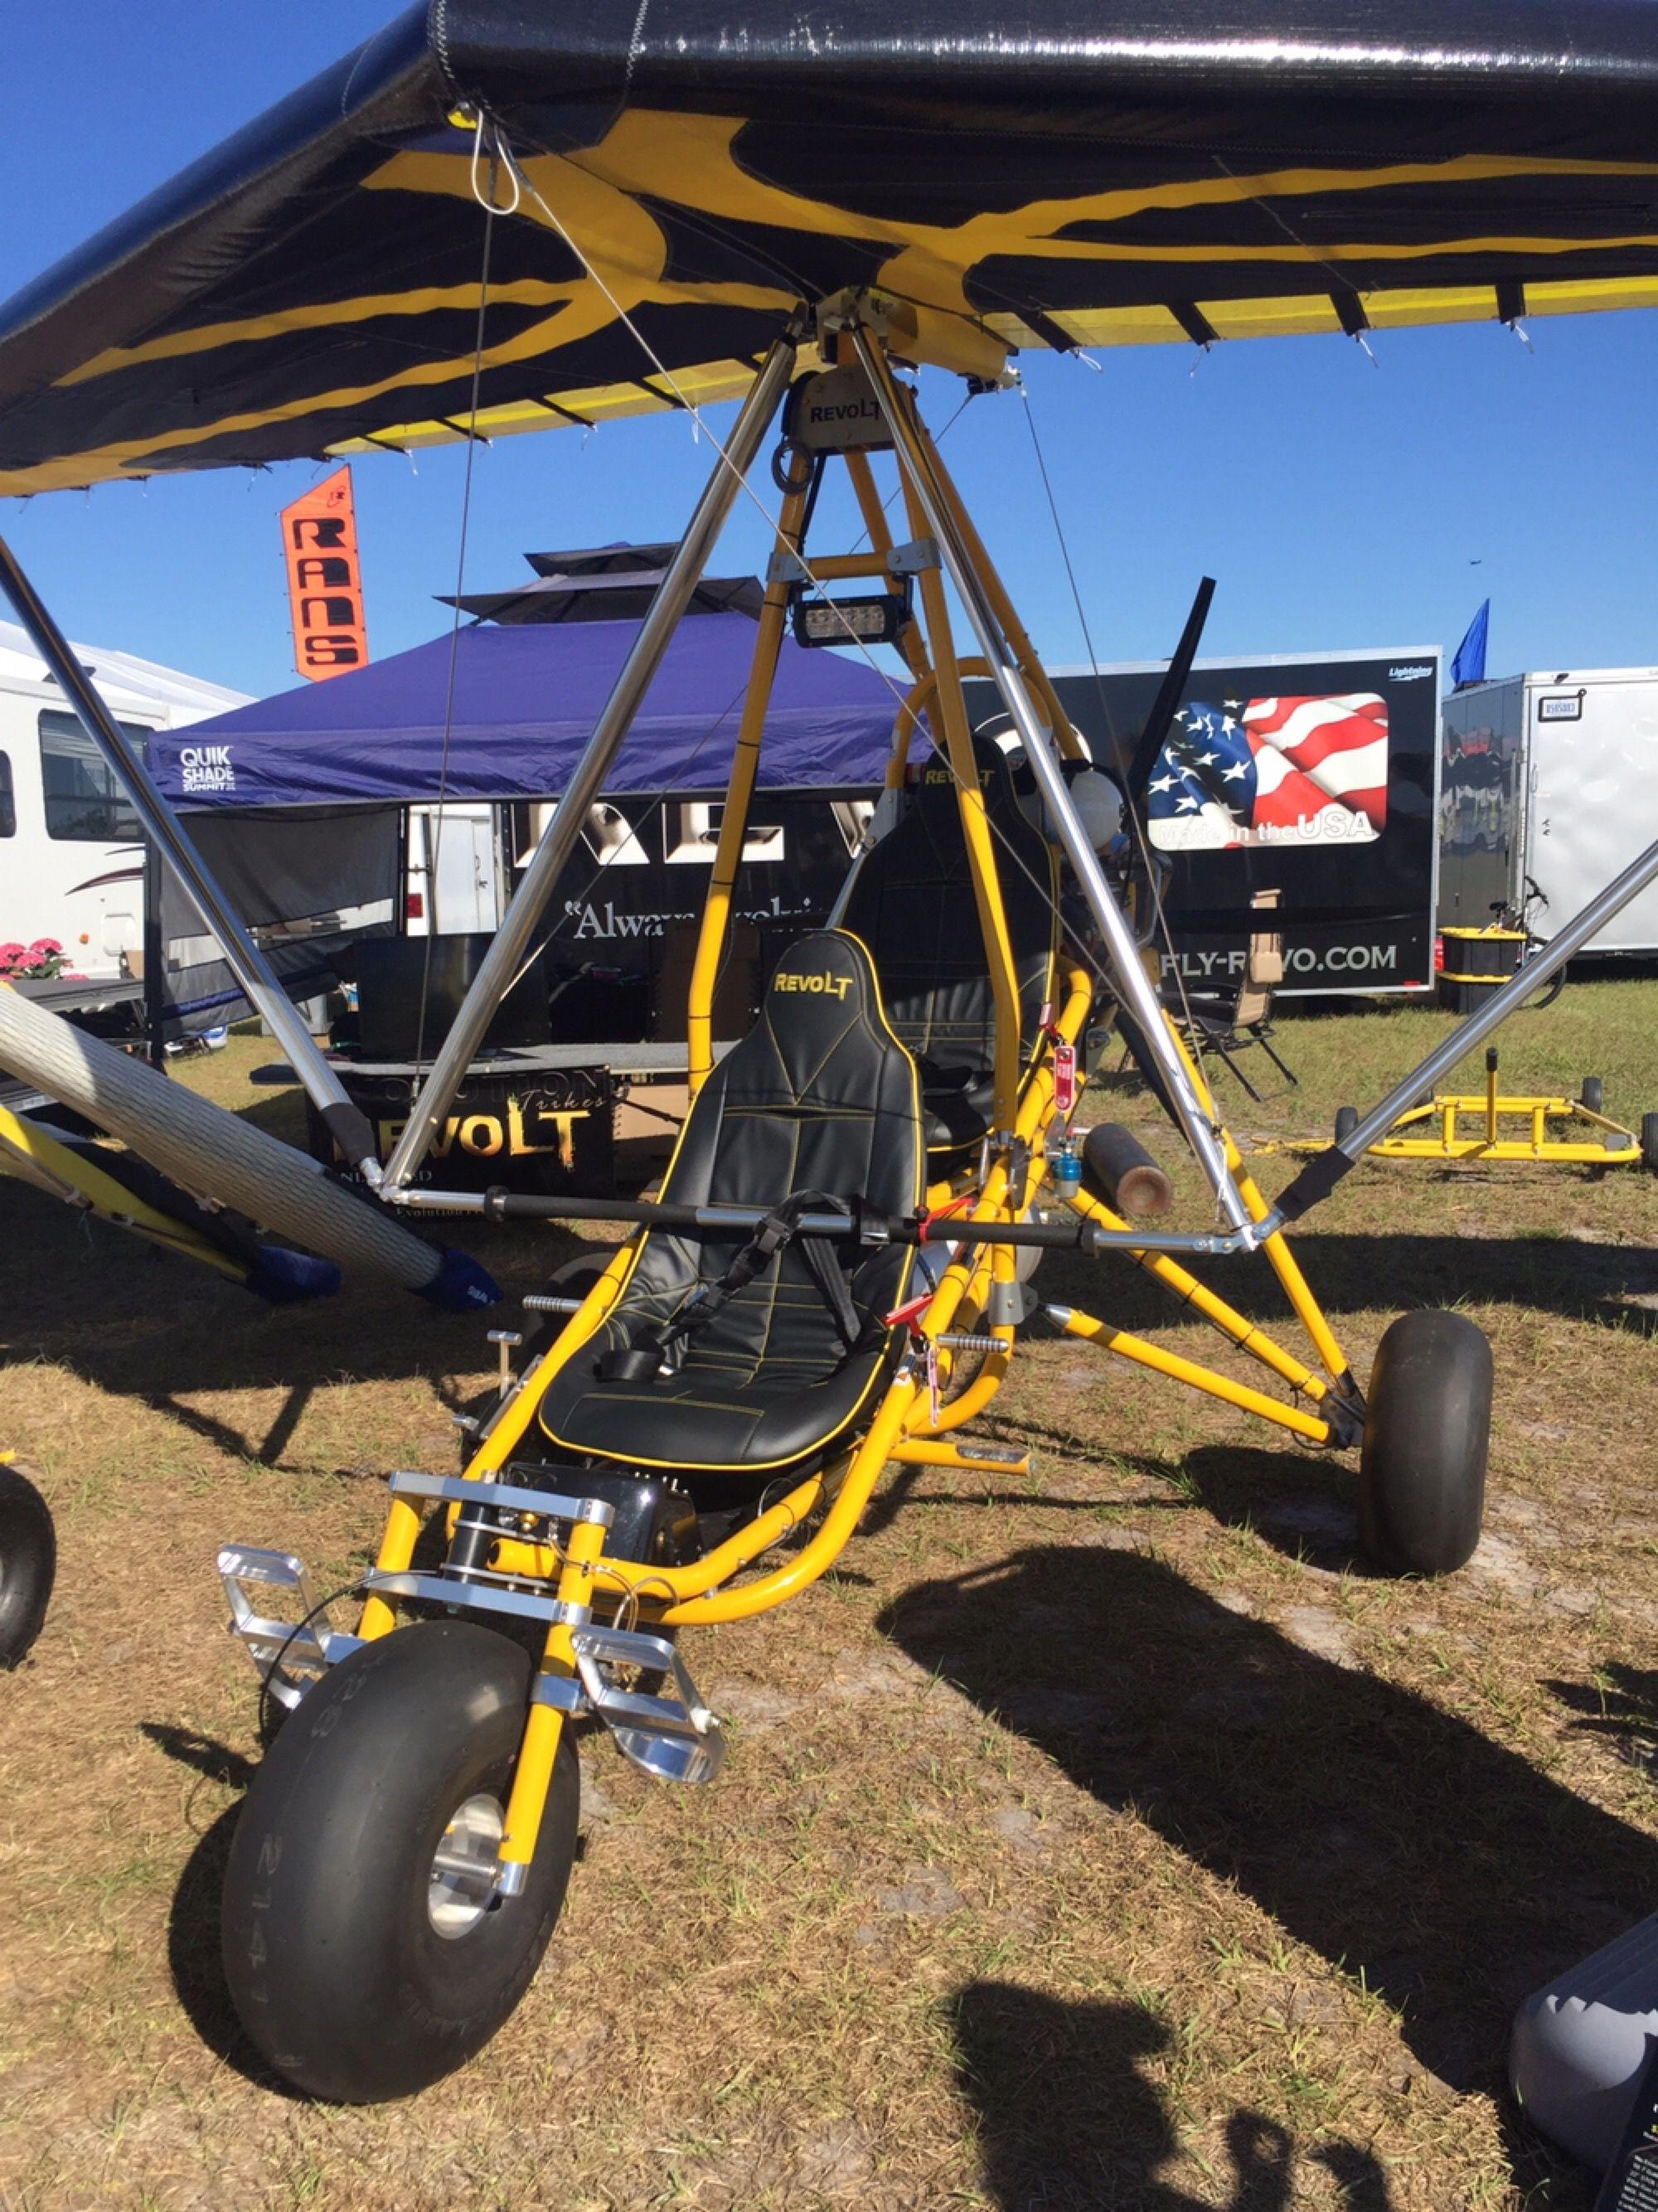 Pin by Joseph Glynn on Ultralight Trikes | Kit planes, Light